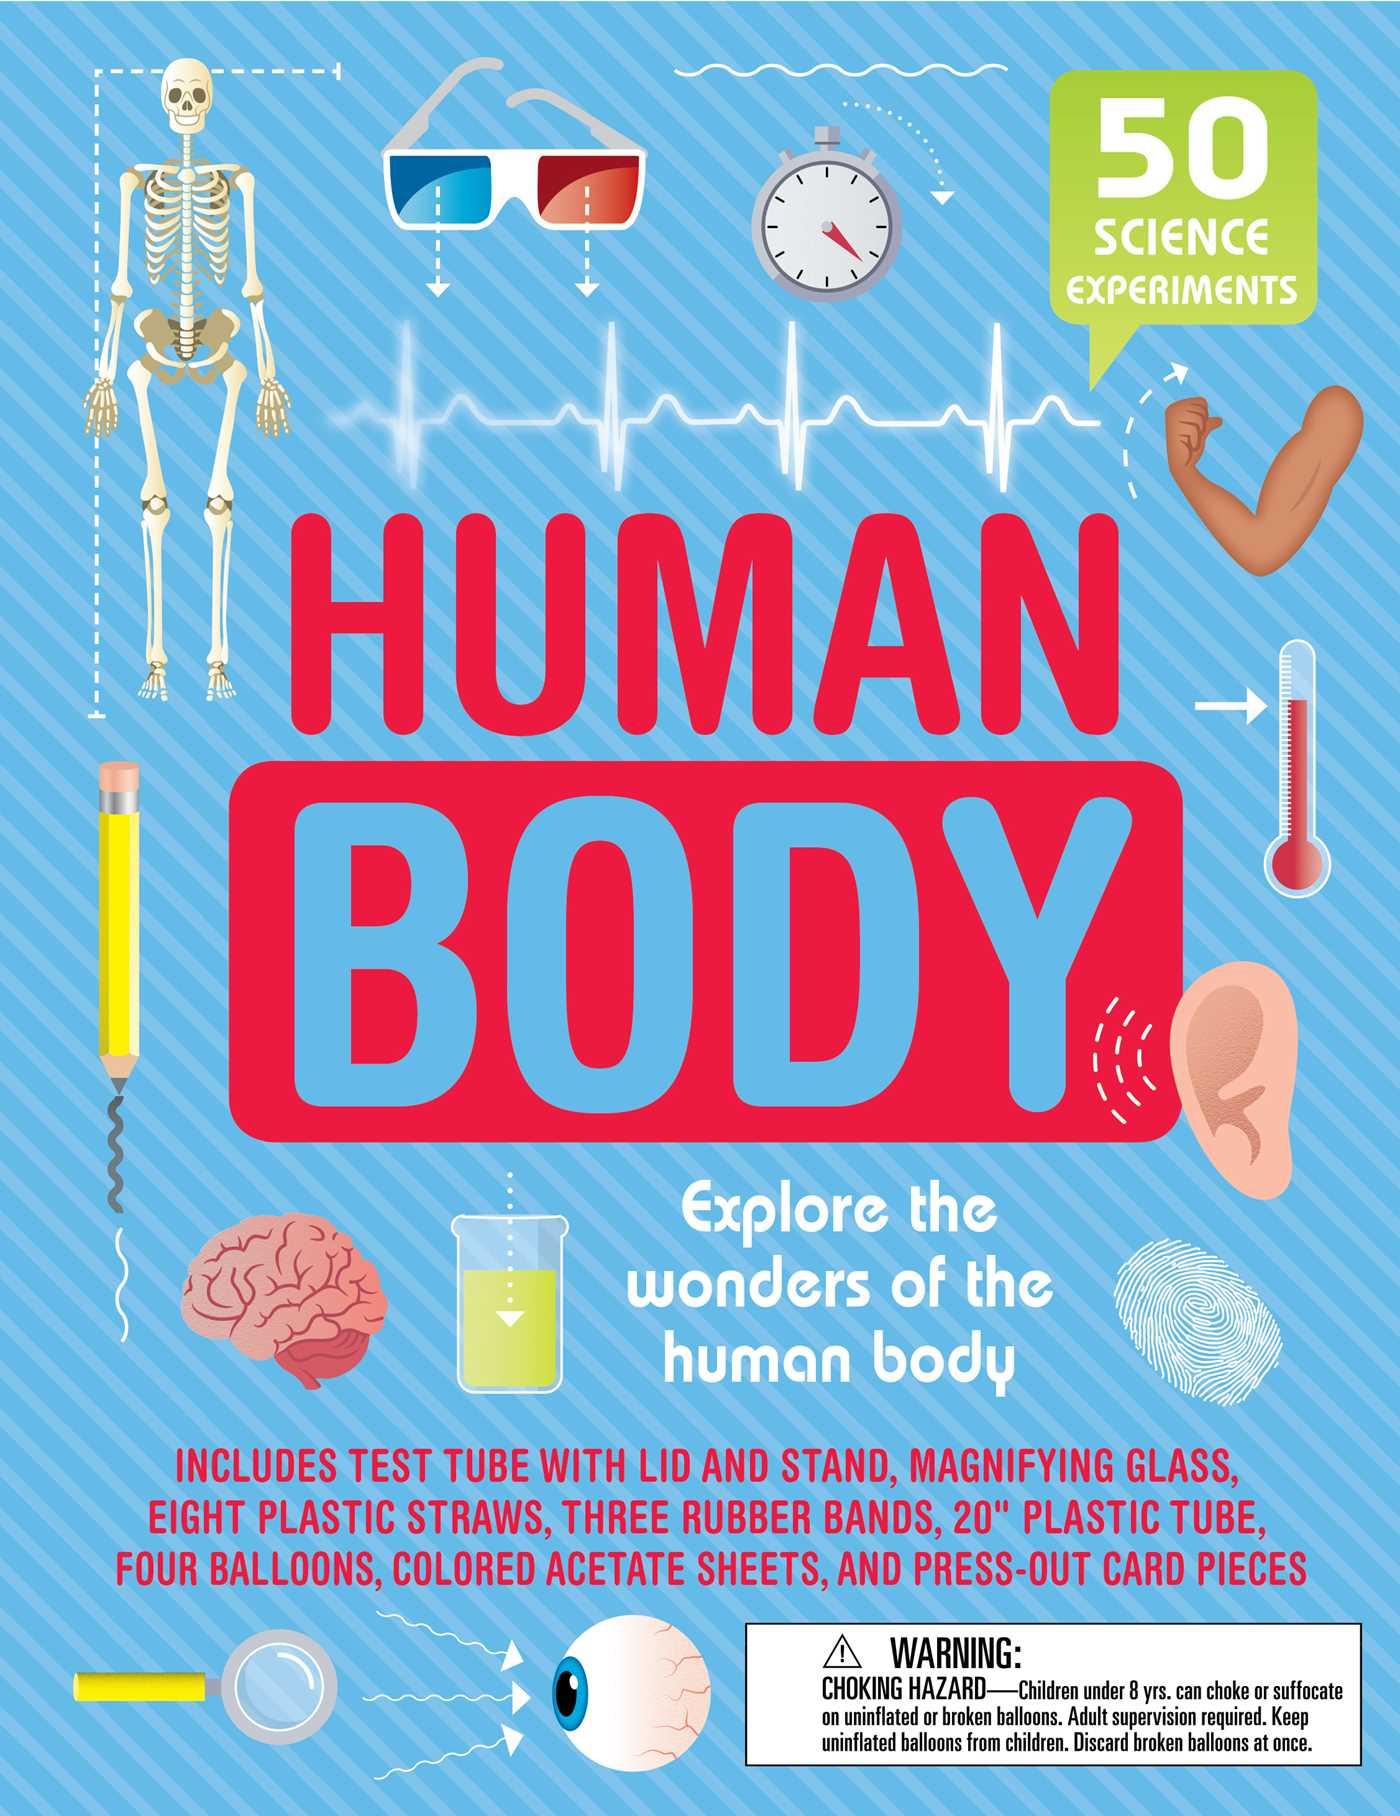 Science lab human body 9781684123292 hr